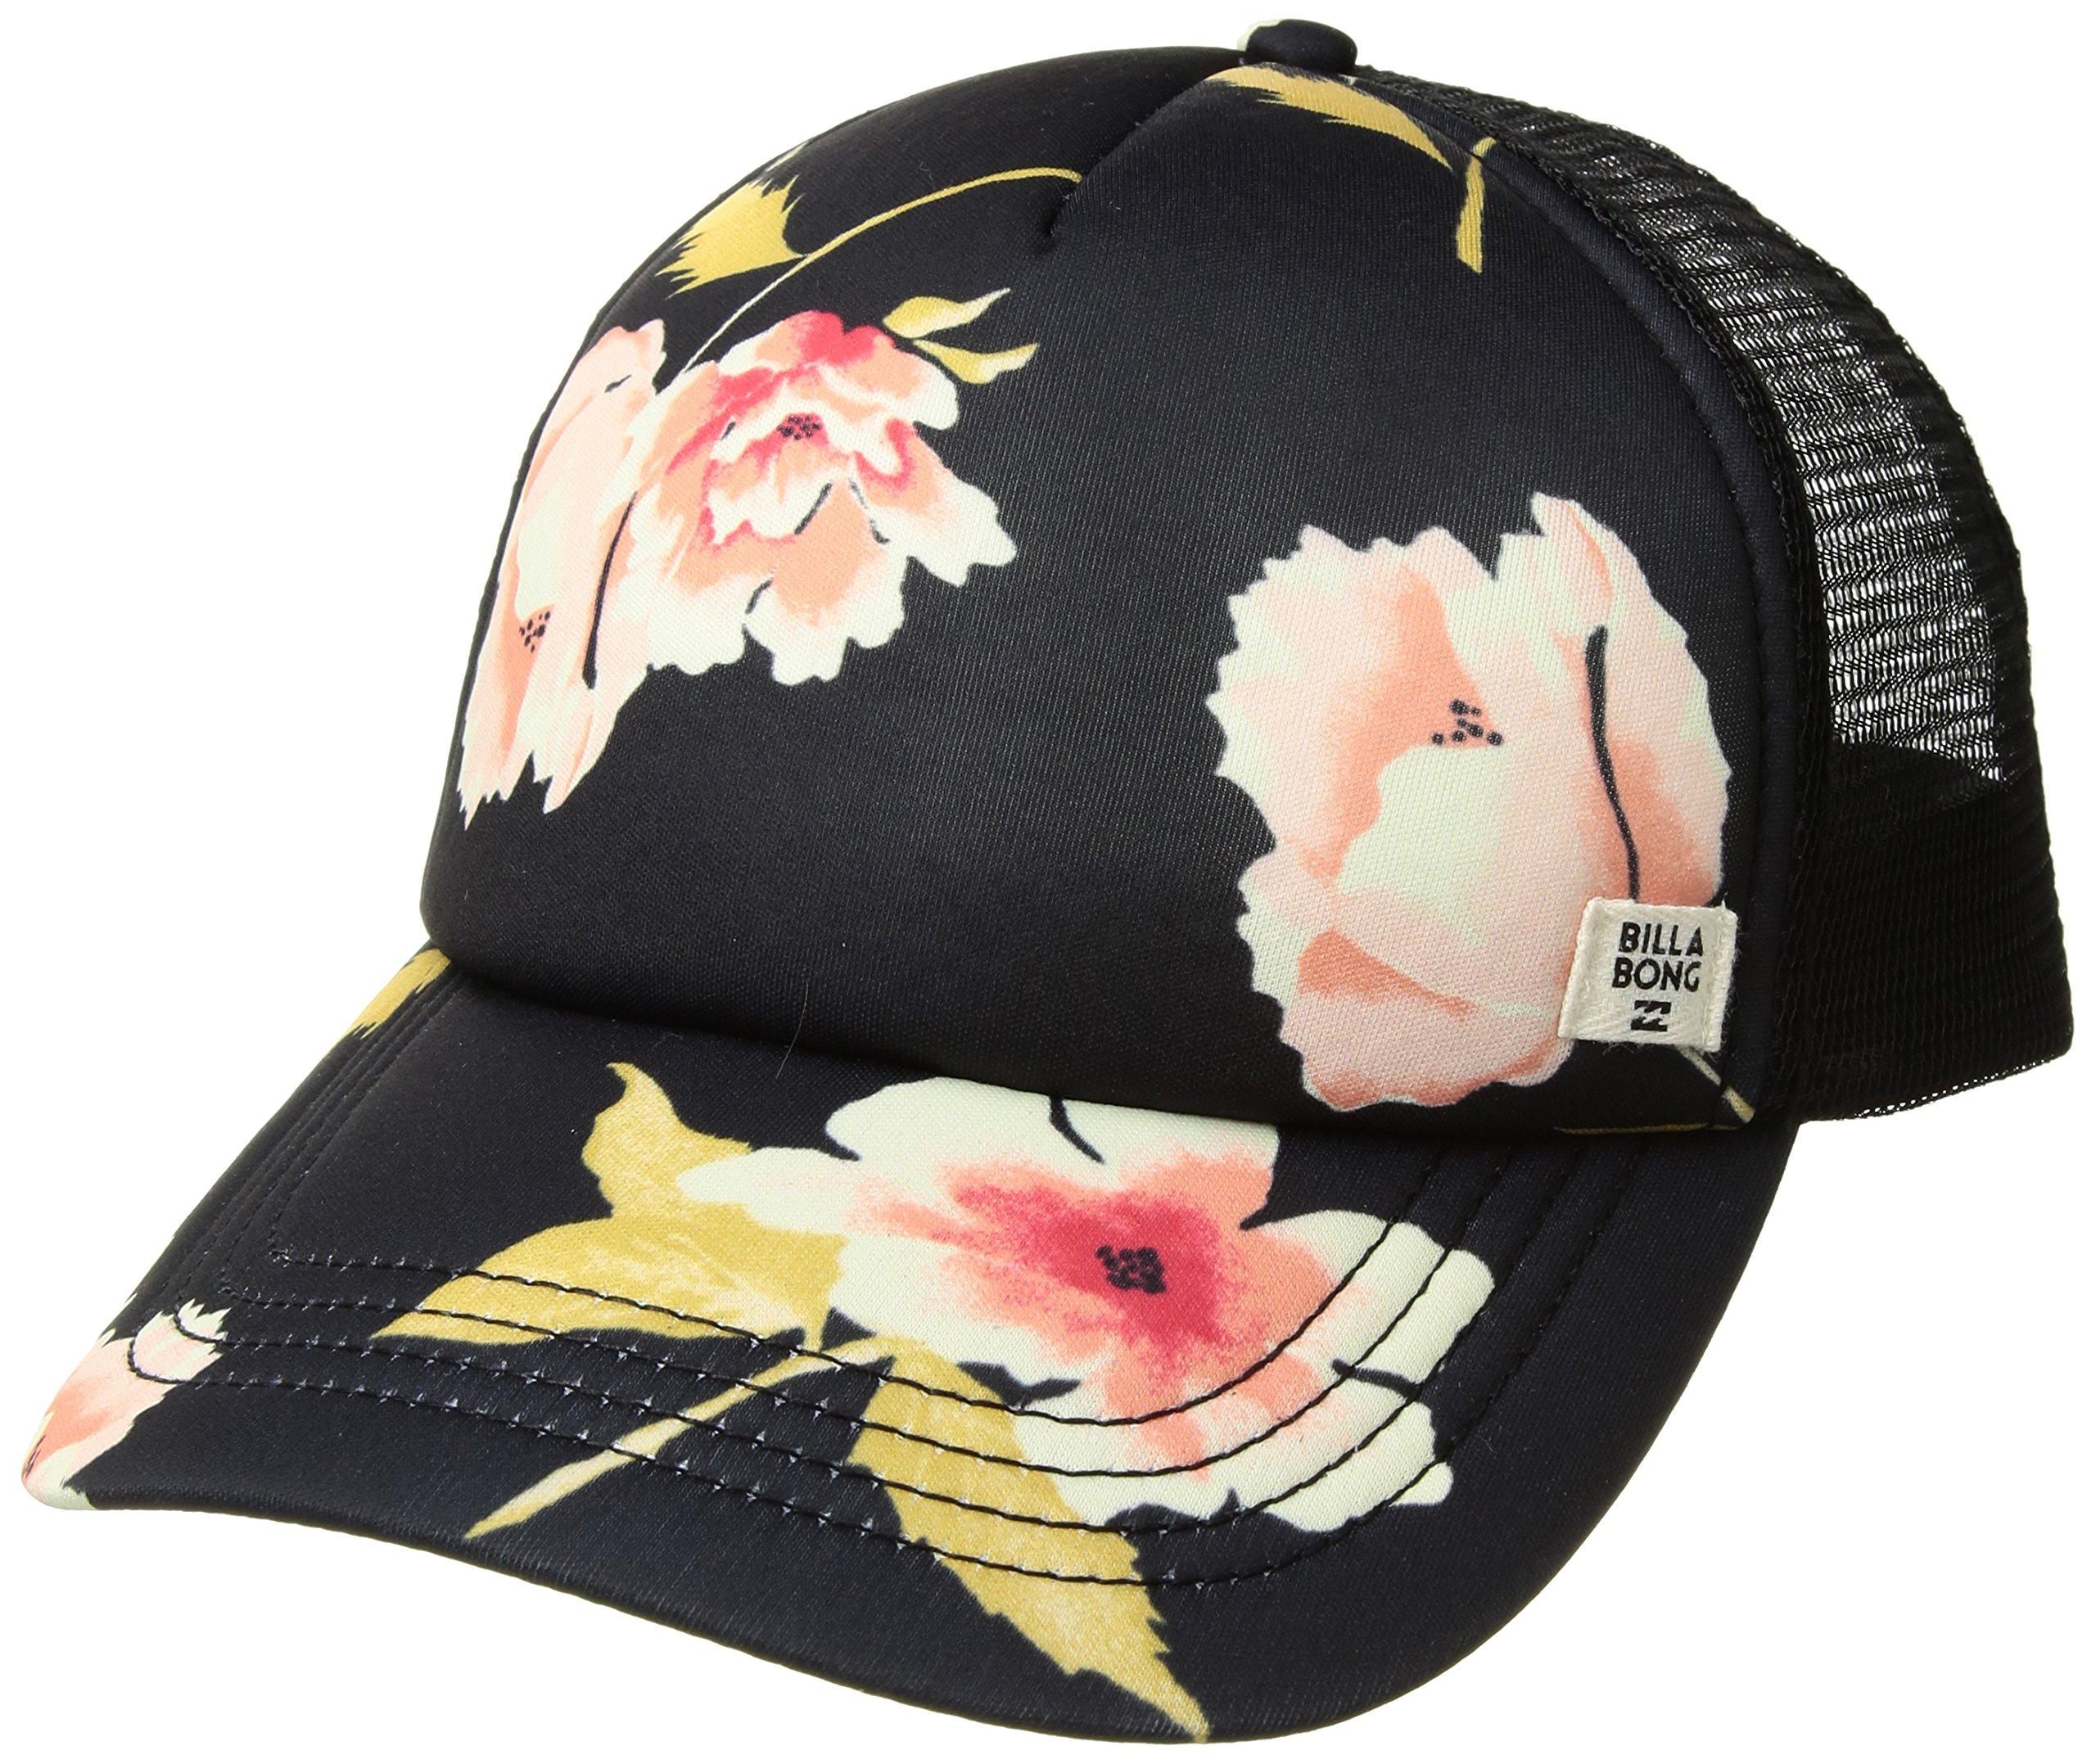 b0e3e15ef1154 Billabong Women s Heritage Mashup Hat